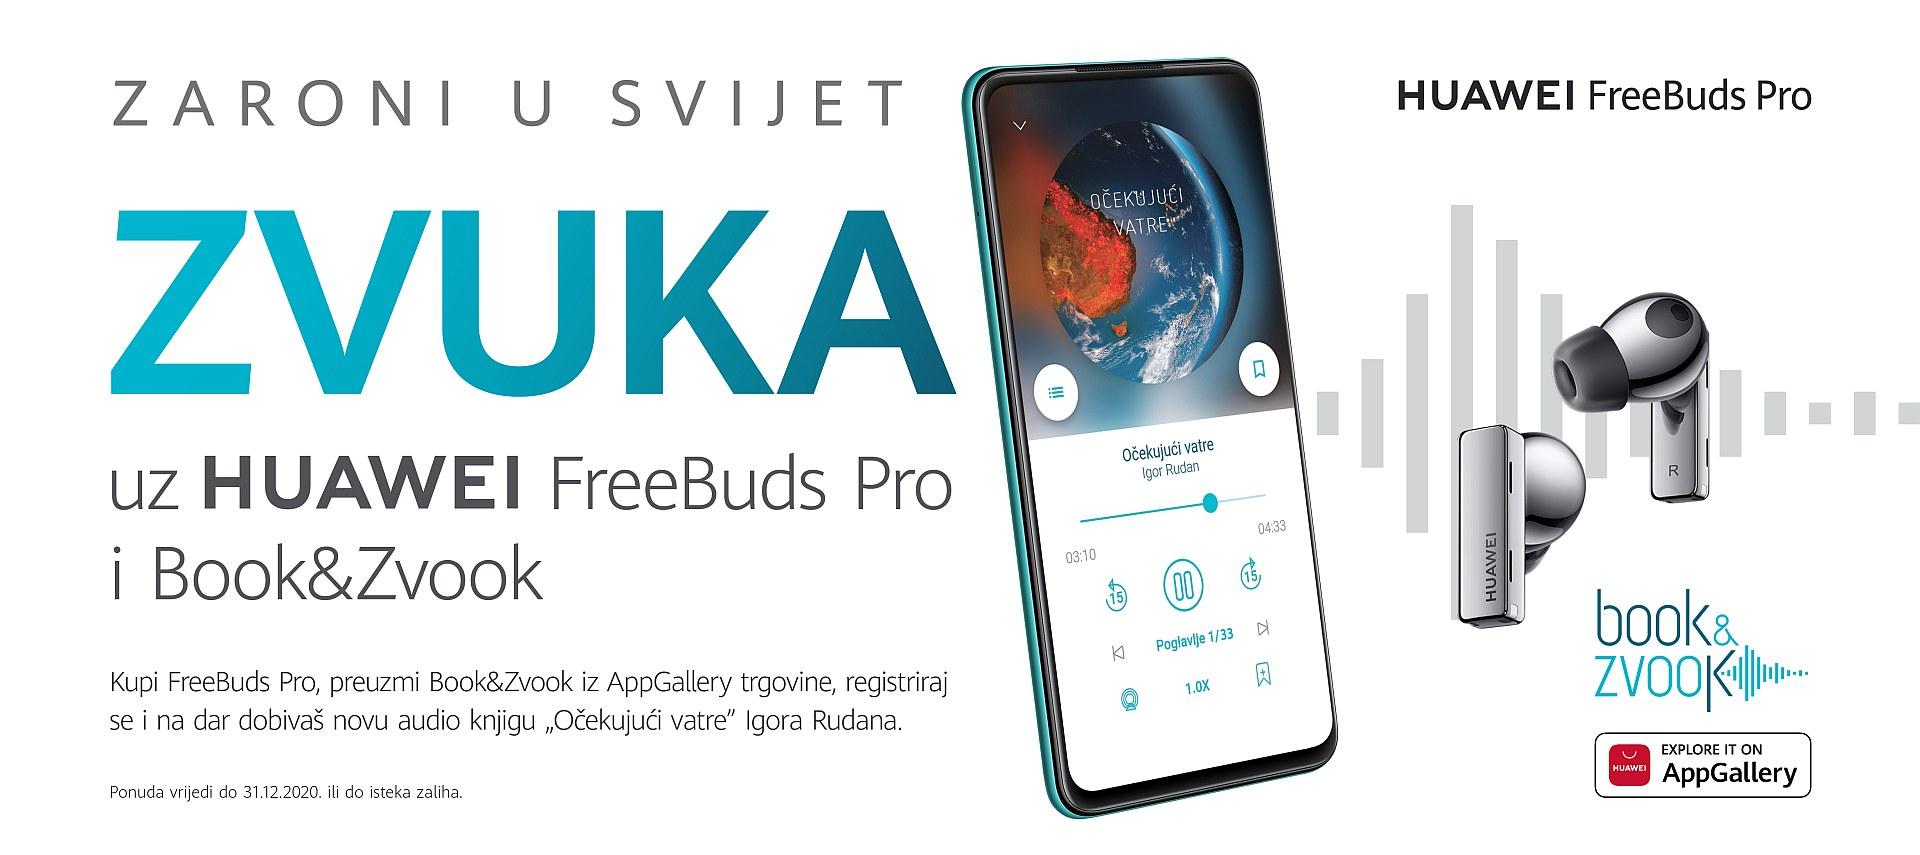 Huawei i bookzvook poklanjaju novu audioknjigu Igora Rudana 1